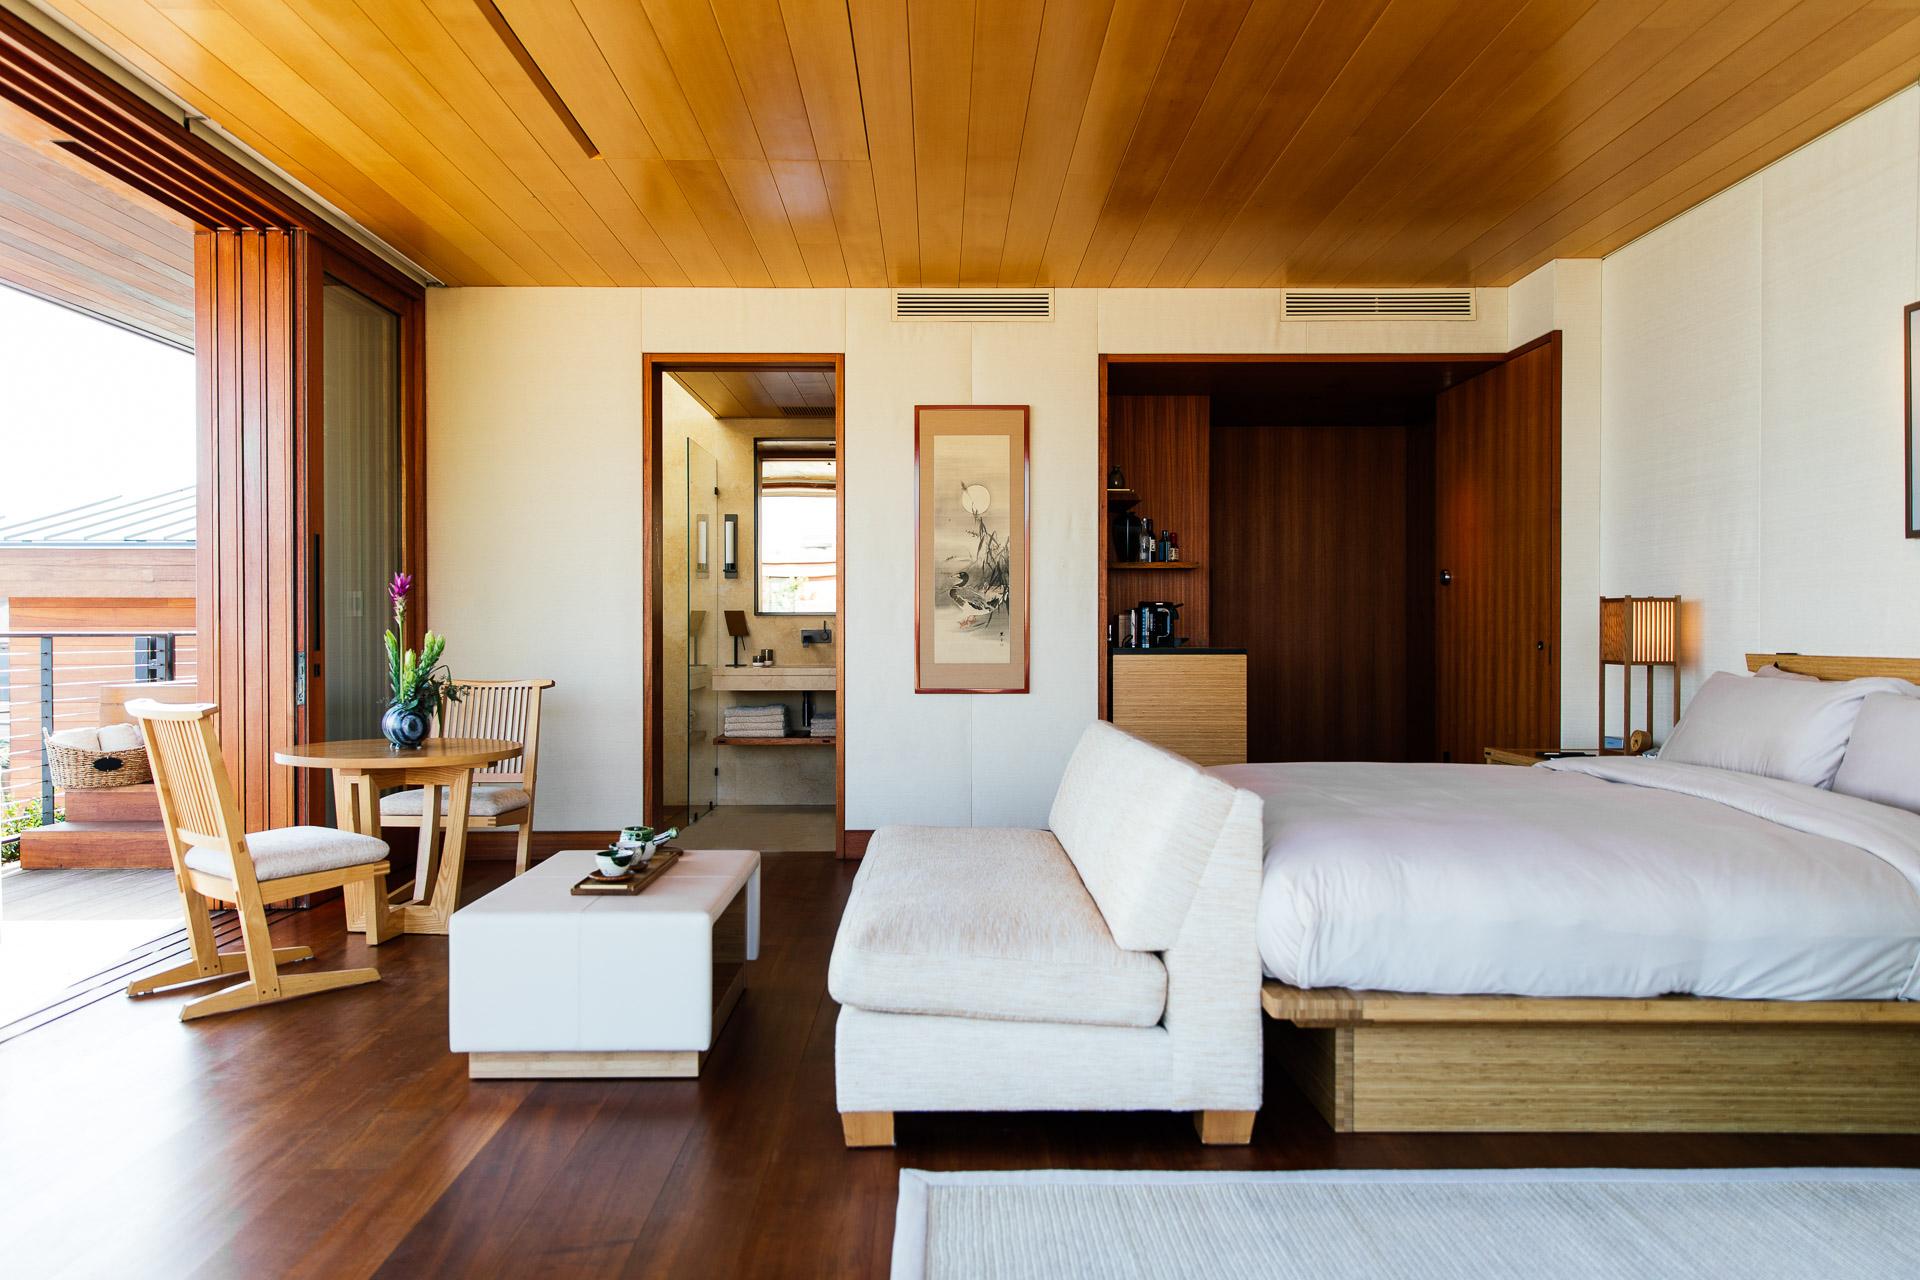 nobu-ryokan-malibu-california-luxury-hotel-photographer-los-angeles-3.jpg